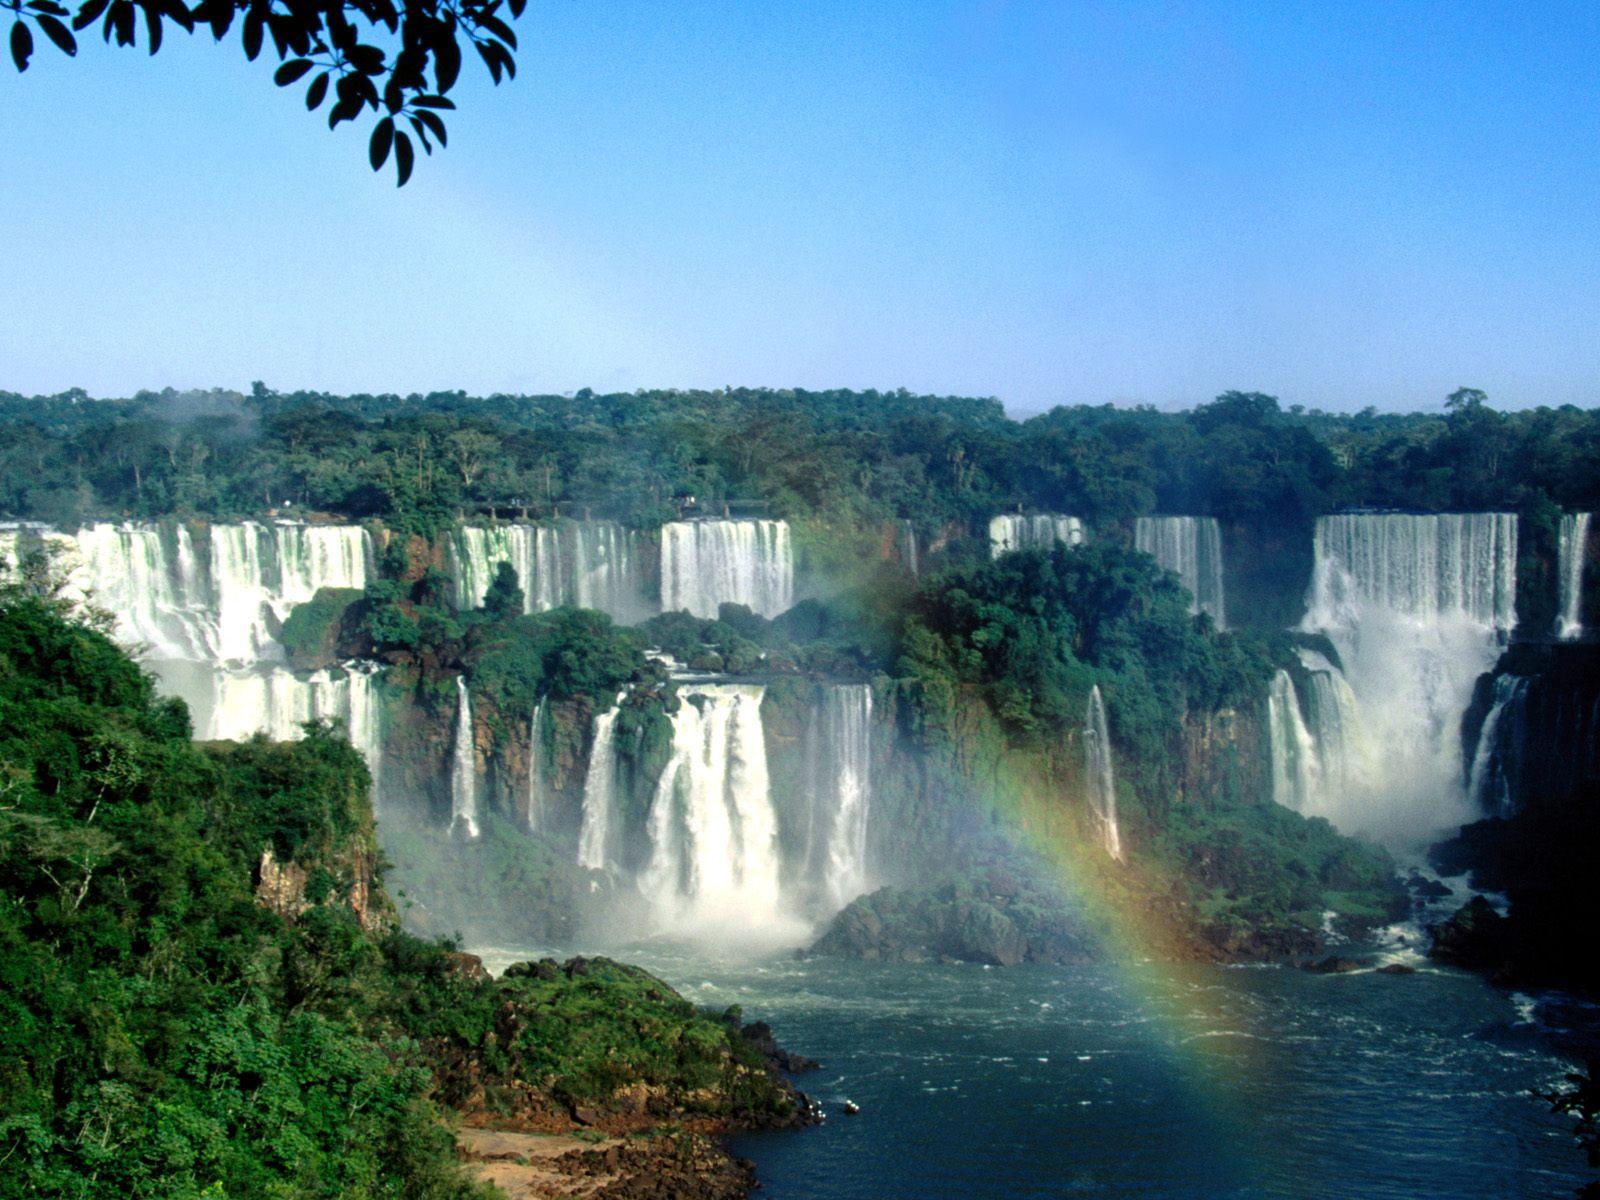 Nova Nazaré Mato Grosso fonte: upload.wikimedia.org